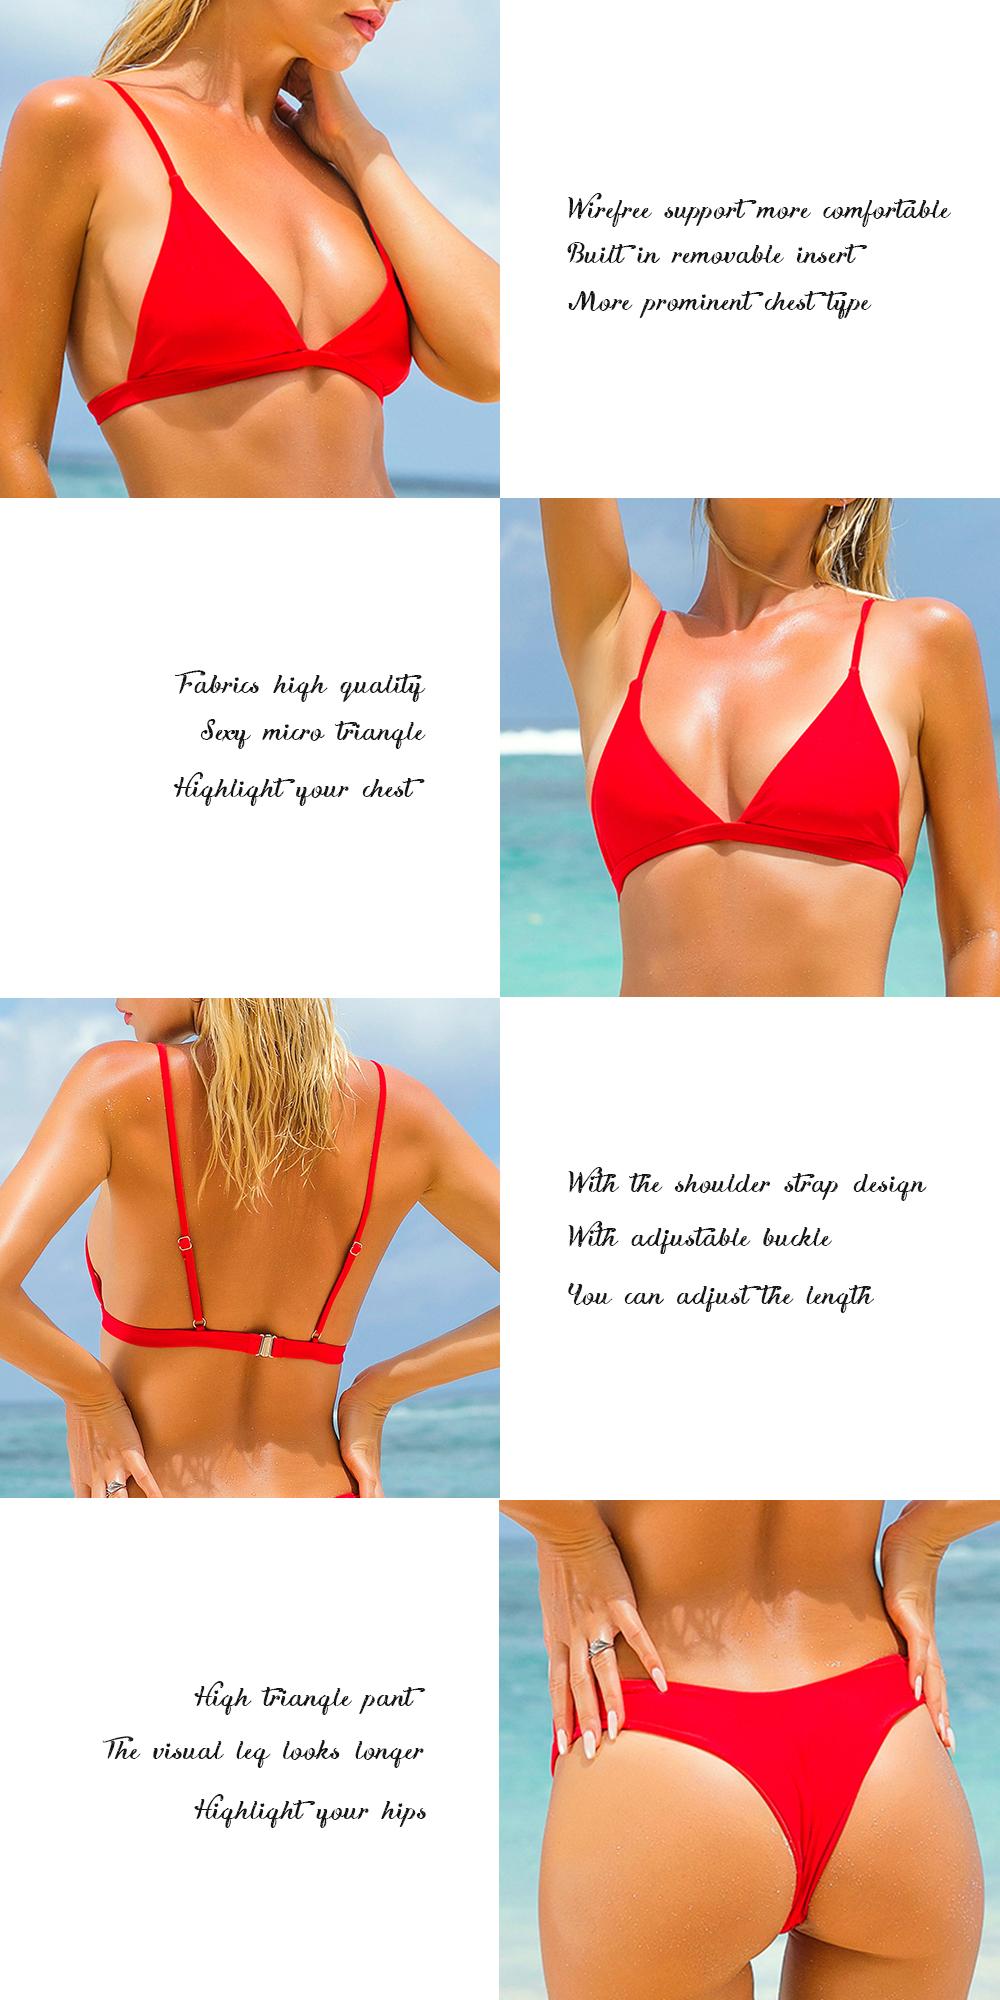 OMKAGI Brand Swimwear Women Swimsuit Sexy Push Up Micro Bikinis Set Swimming Bathing Suit Beachwear Summer Brazilian Bikini 2019 12